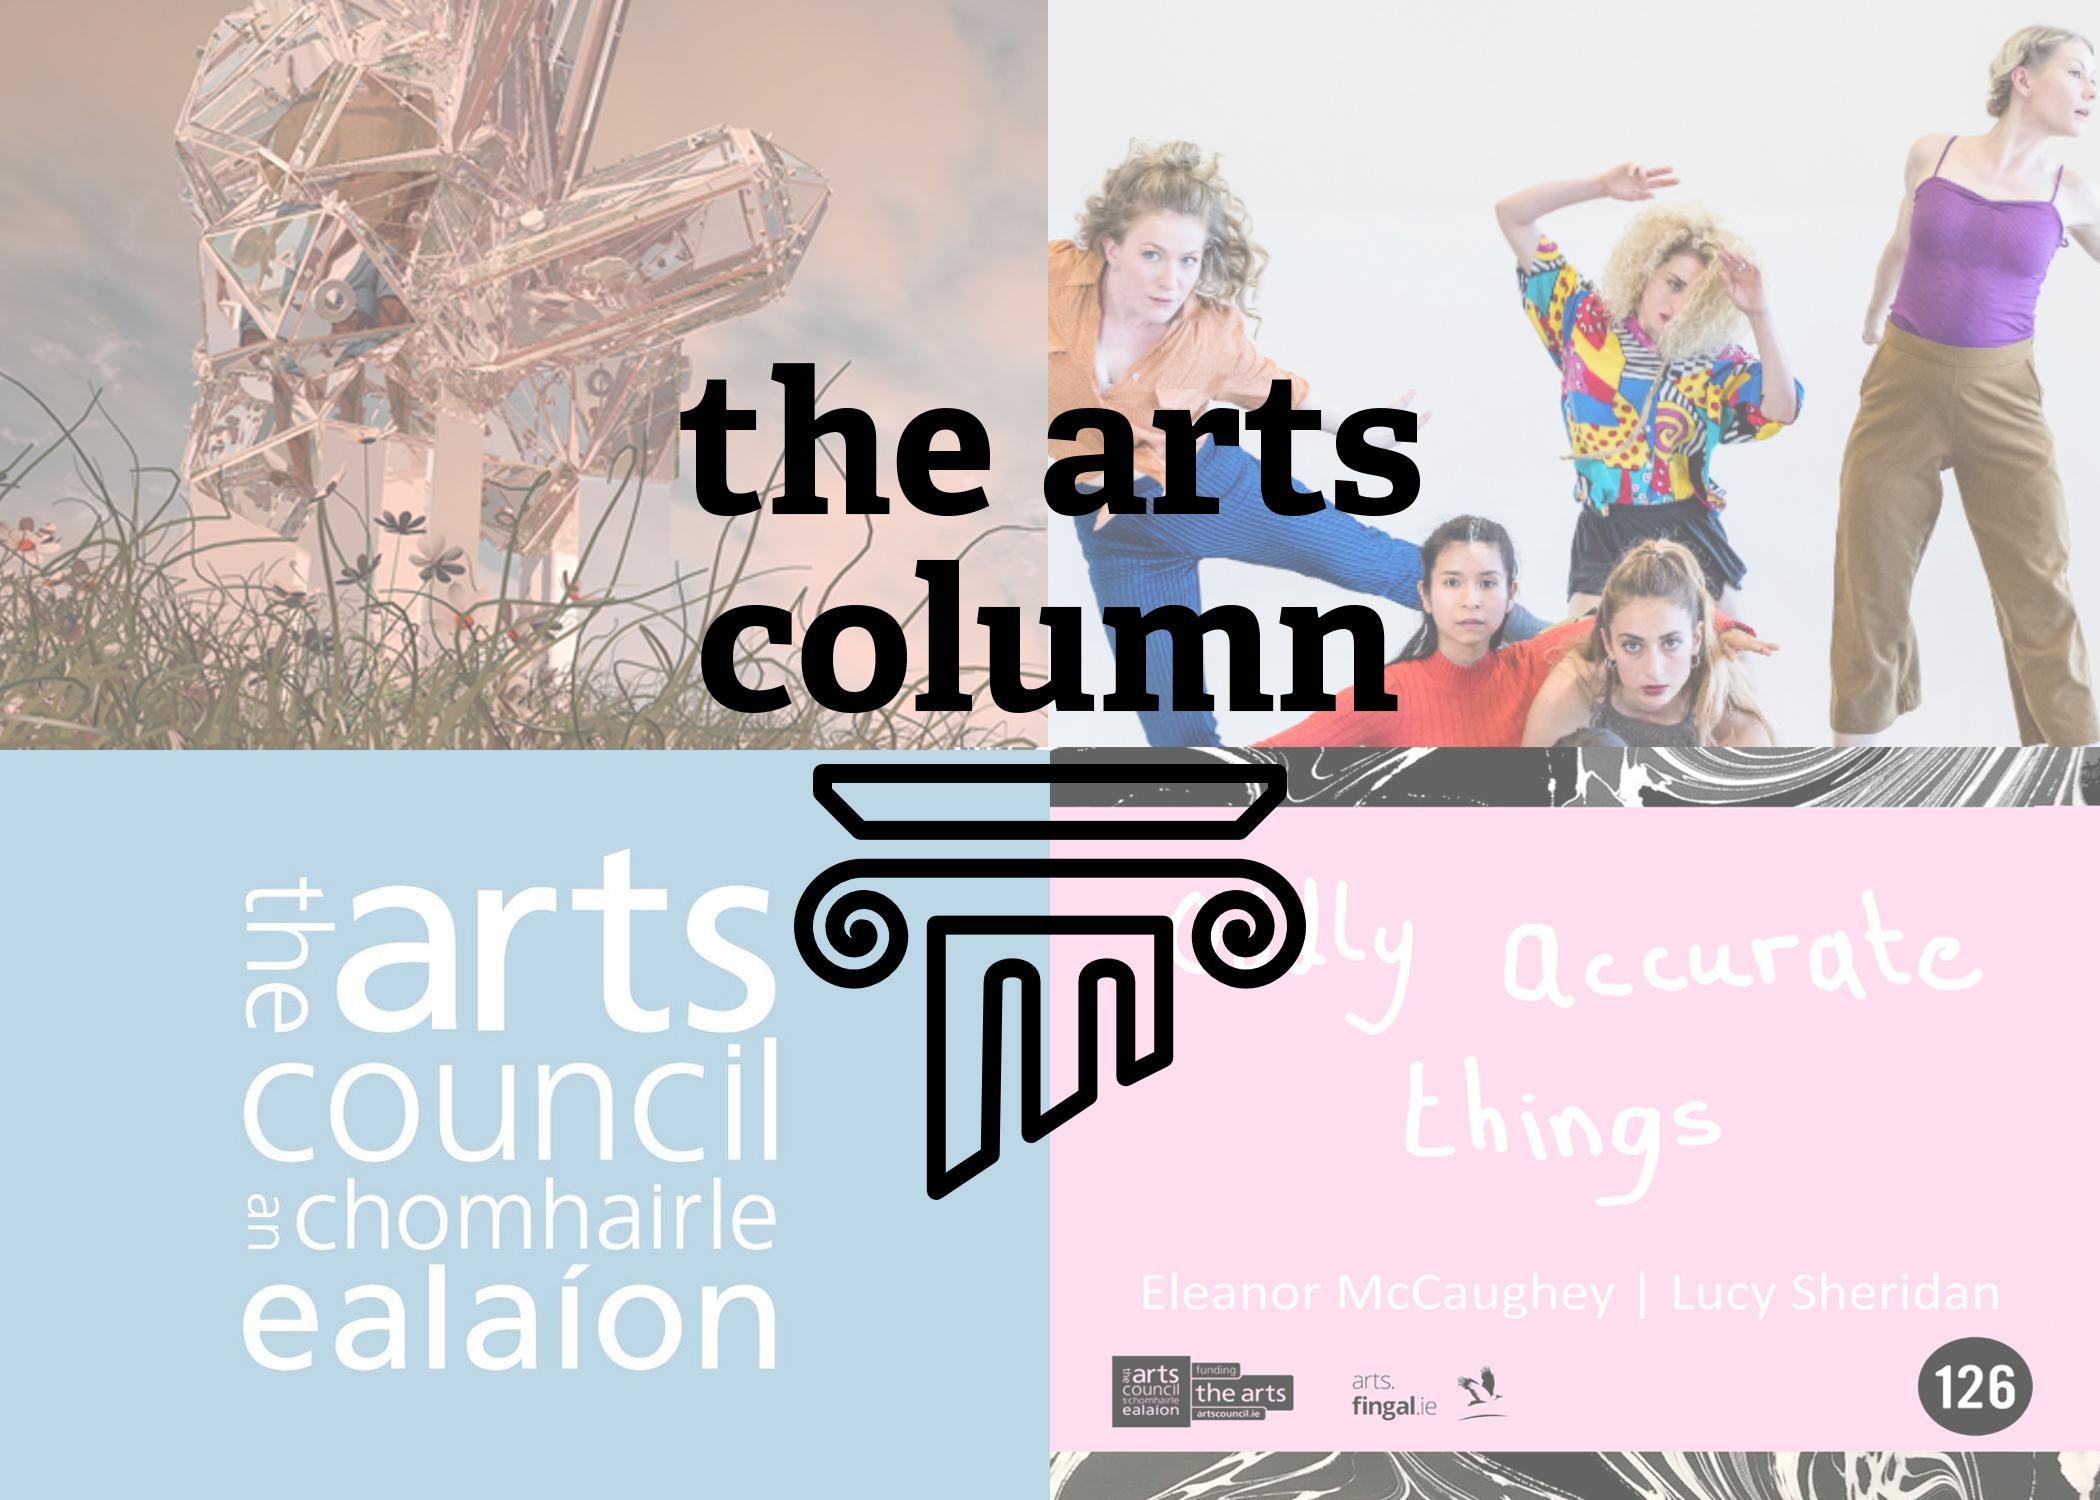 the_arts_column_25